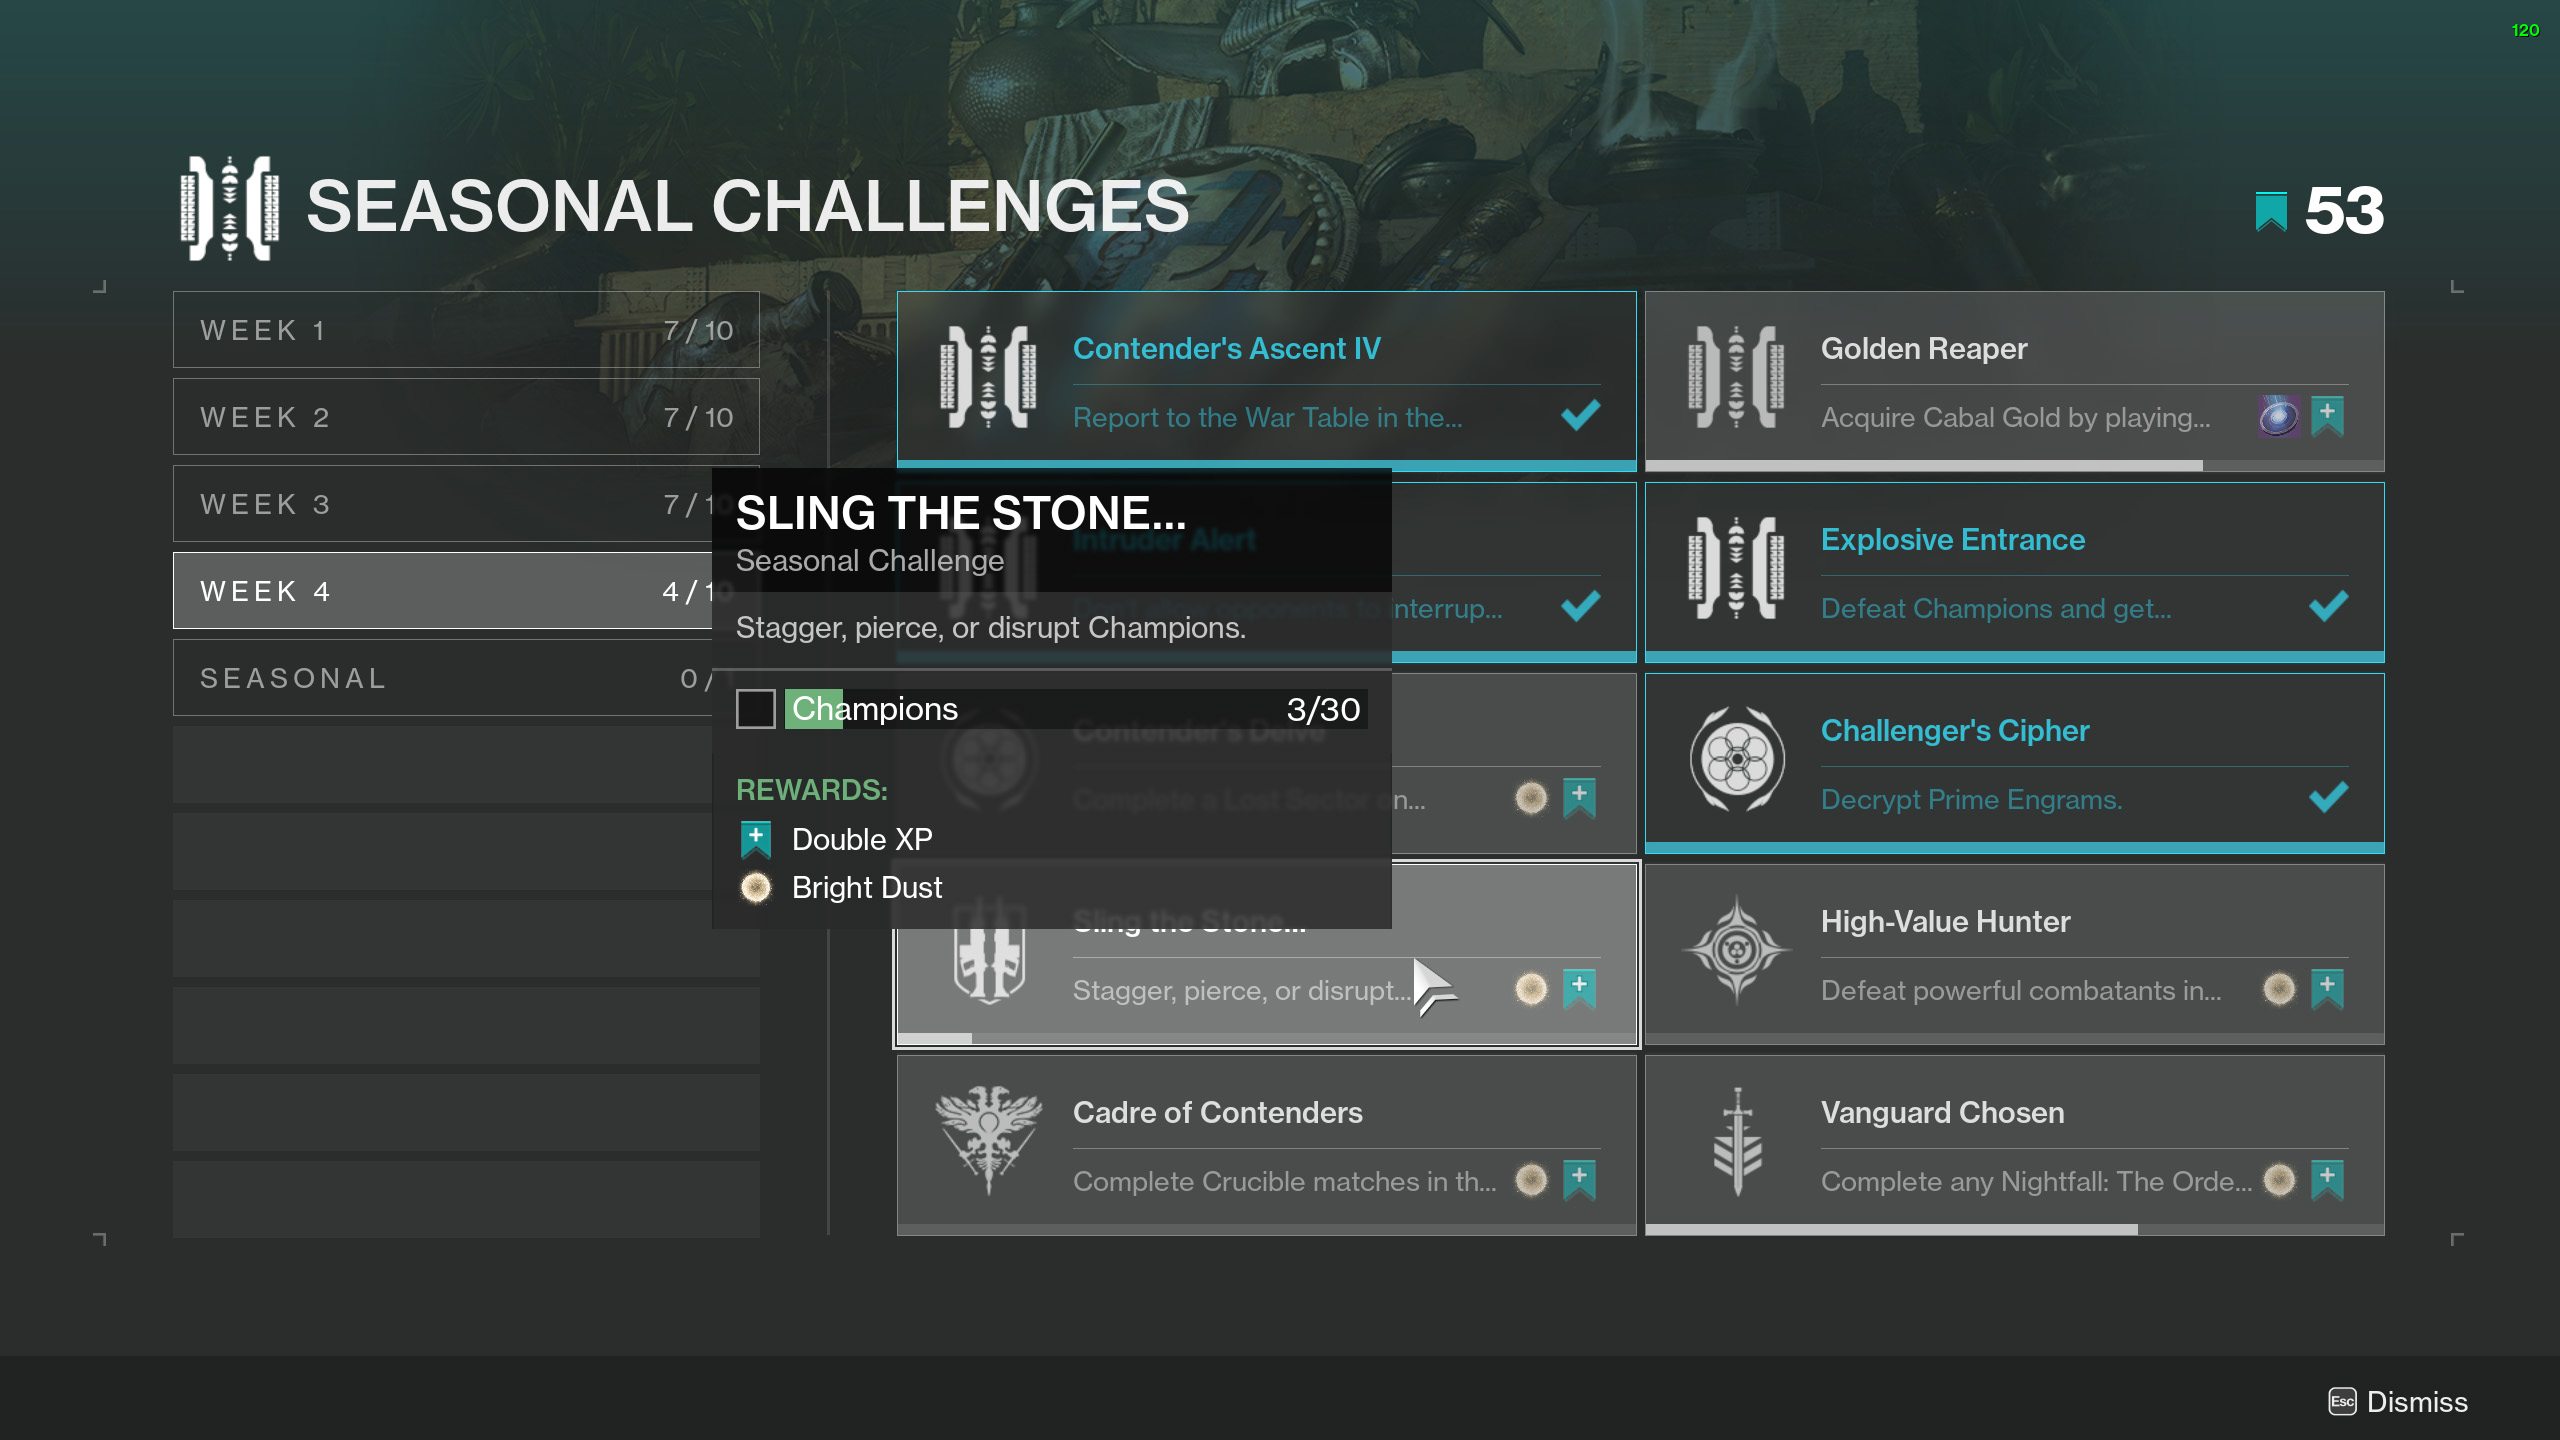 destiny 2 sling the stone seasonal challenge